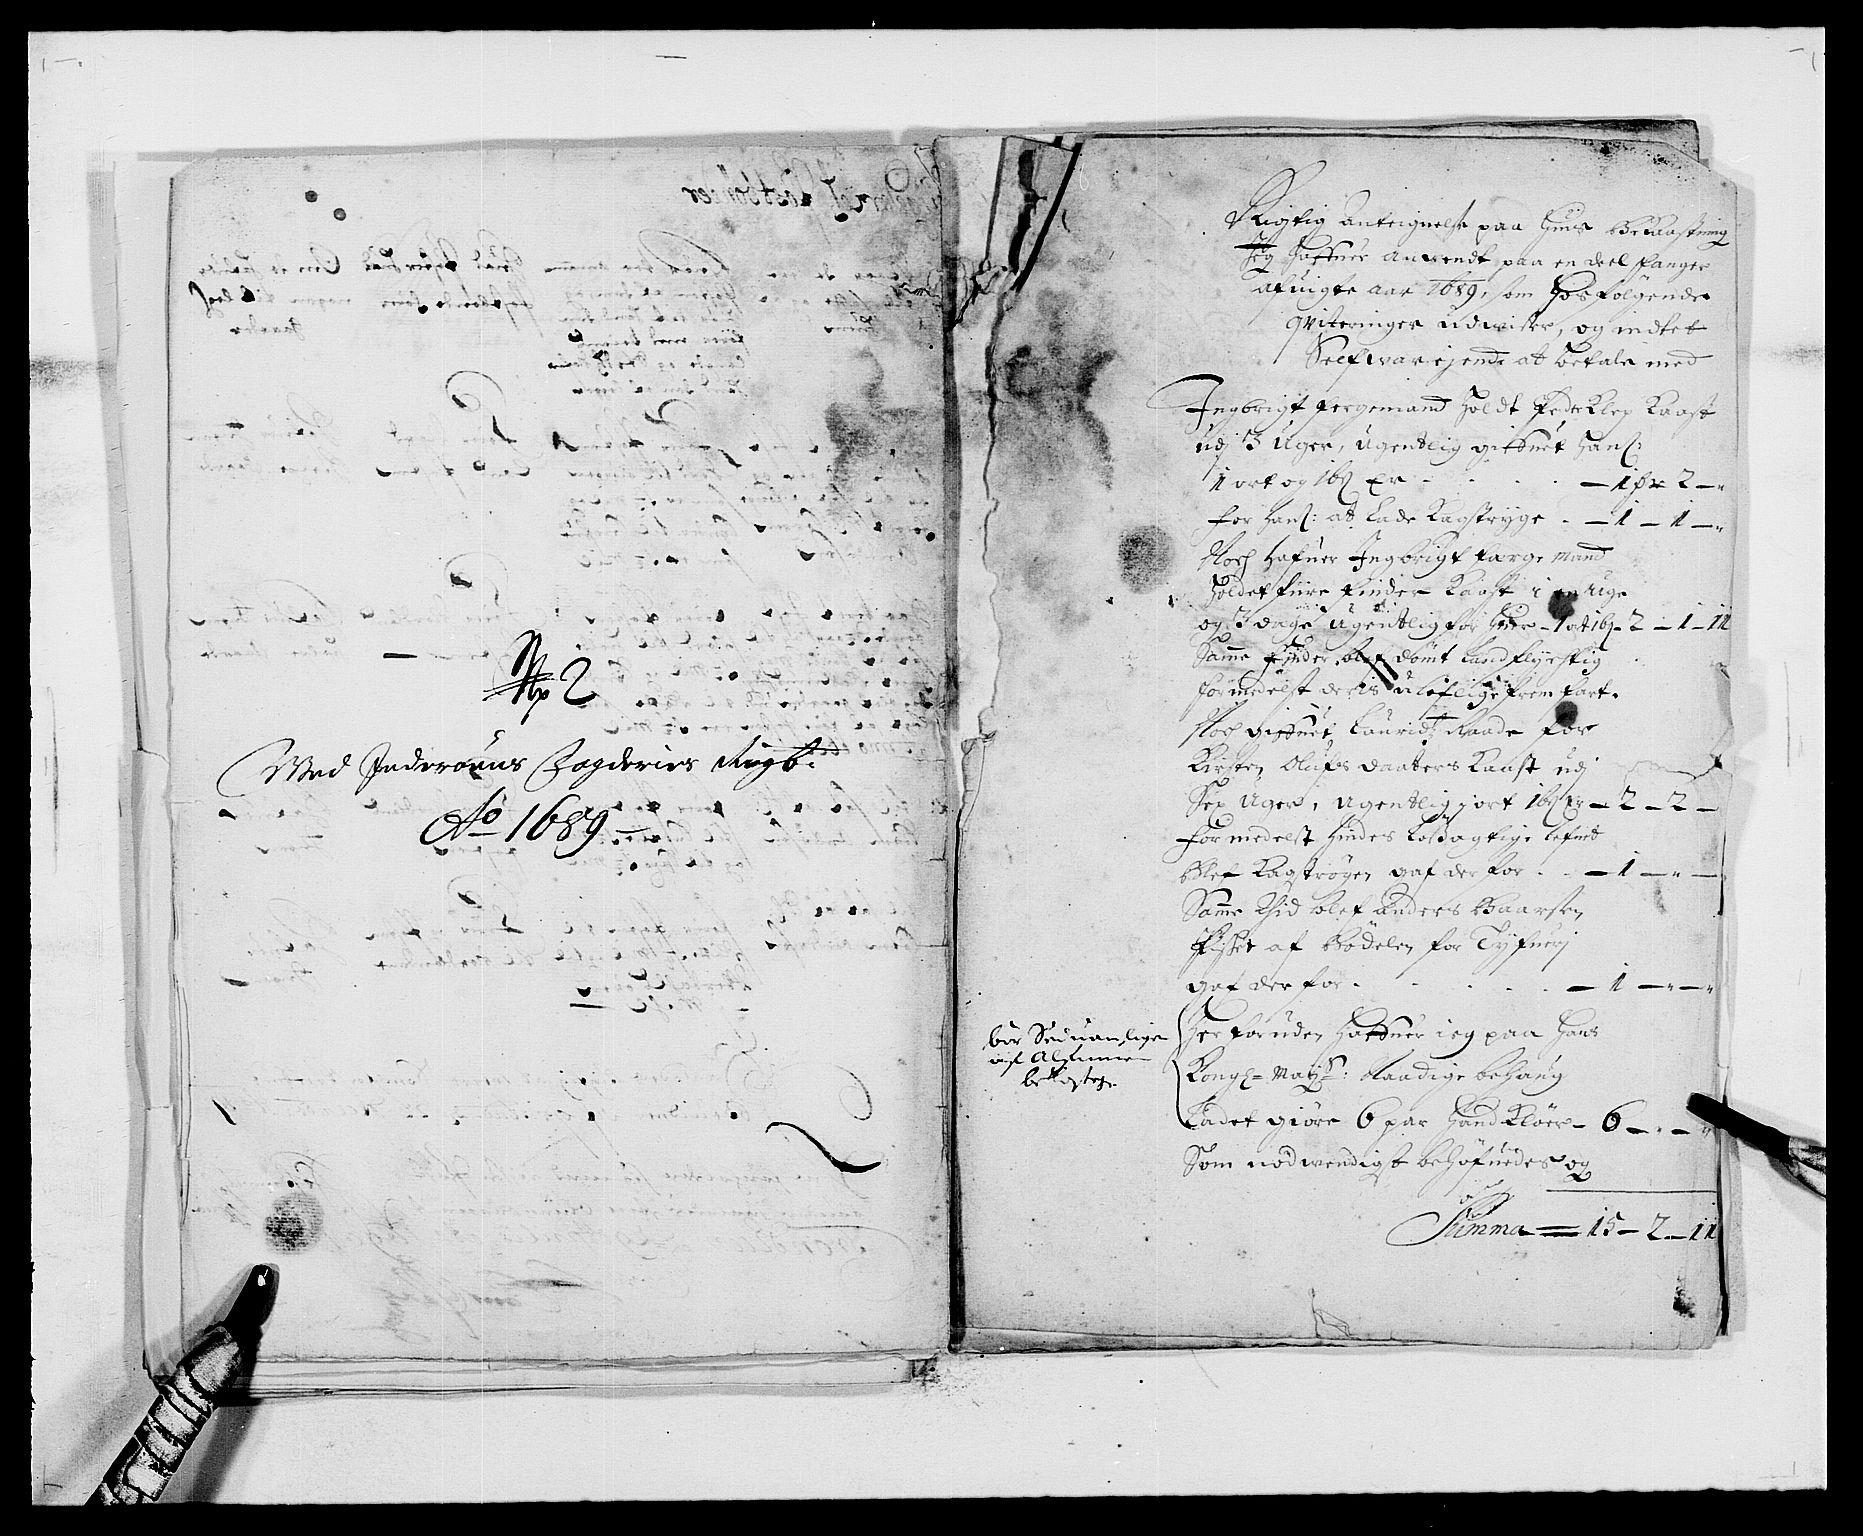 RA, Rentekammeret inntil 1814, Reviderte regnskaper, Fogderegnskap, R63/L4306: Fogderegnskap Inderøy, 1687-1689, s. 512